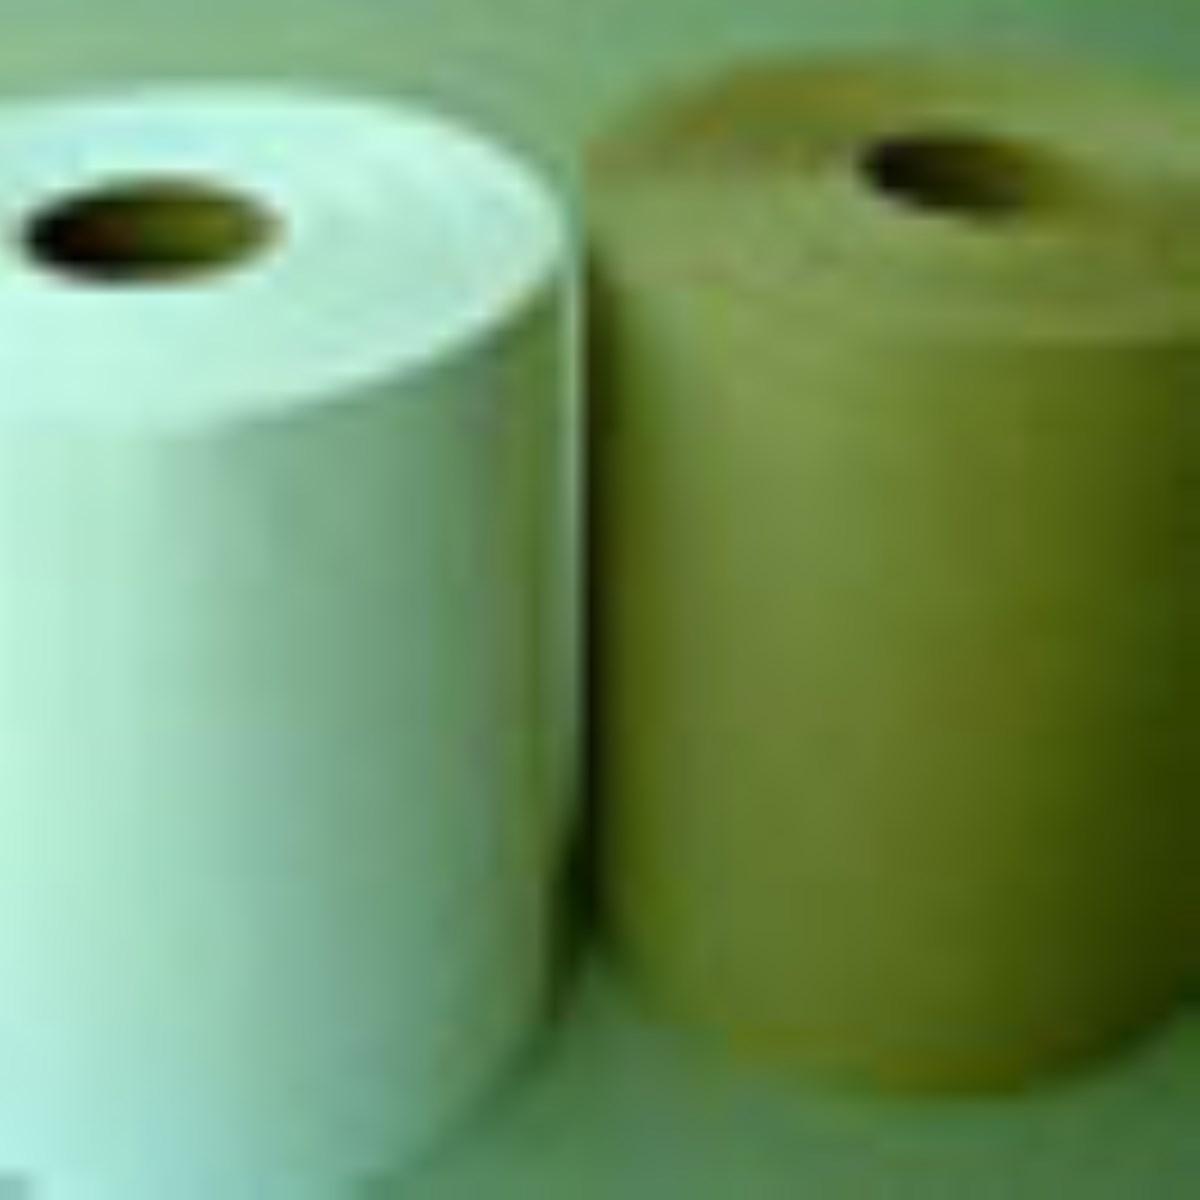 کاغذ ، توليد ، بازيافت (5)